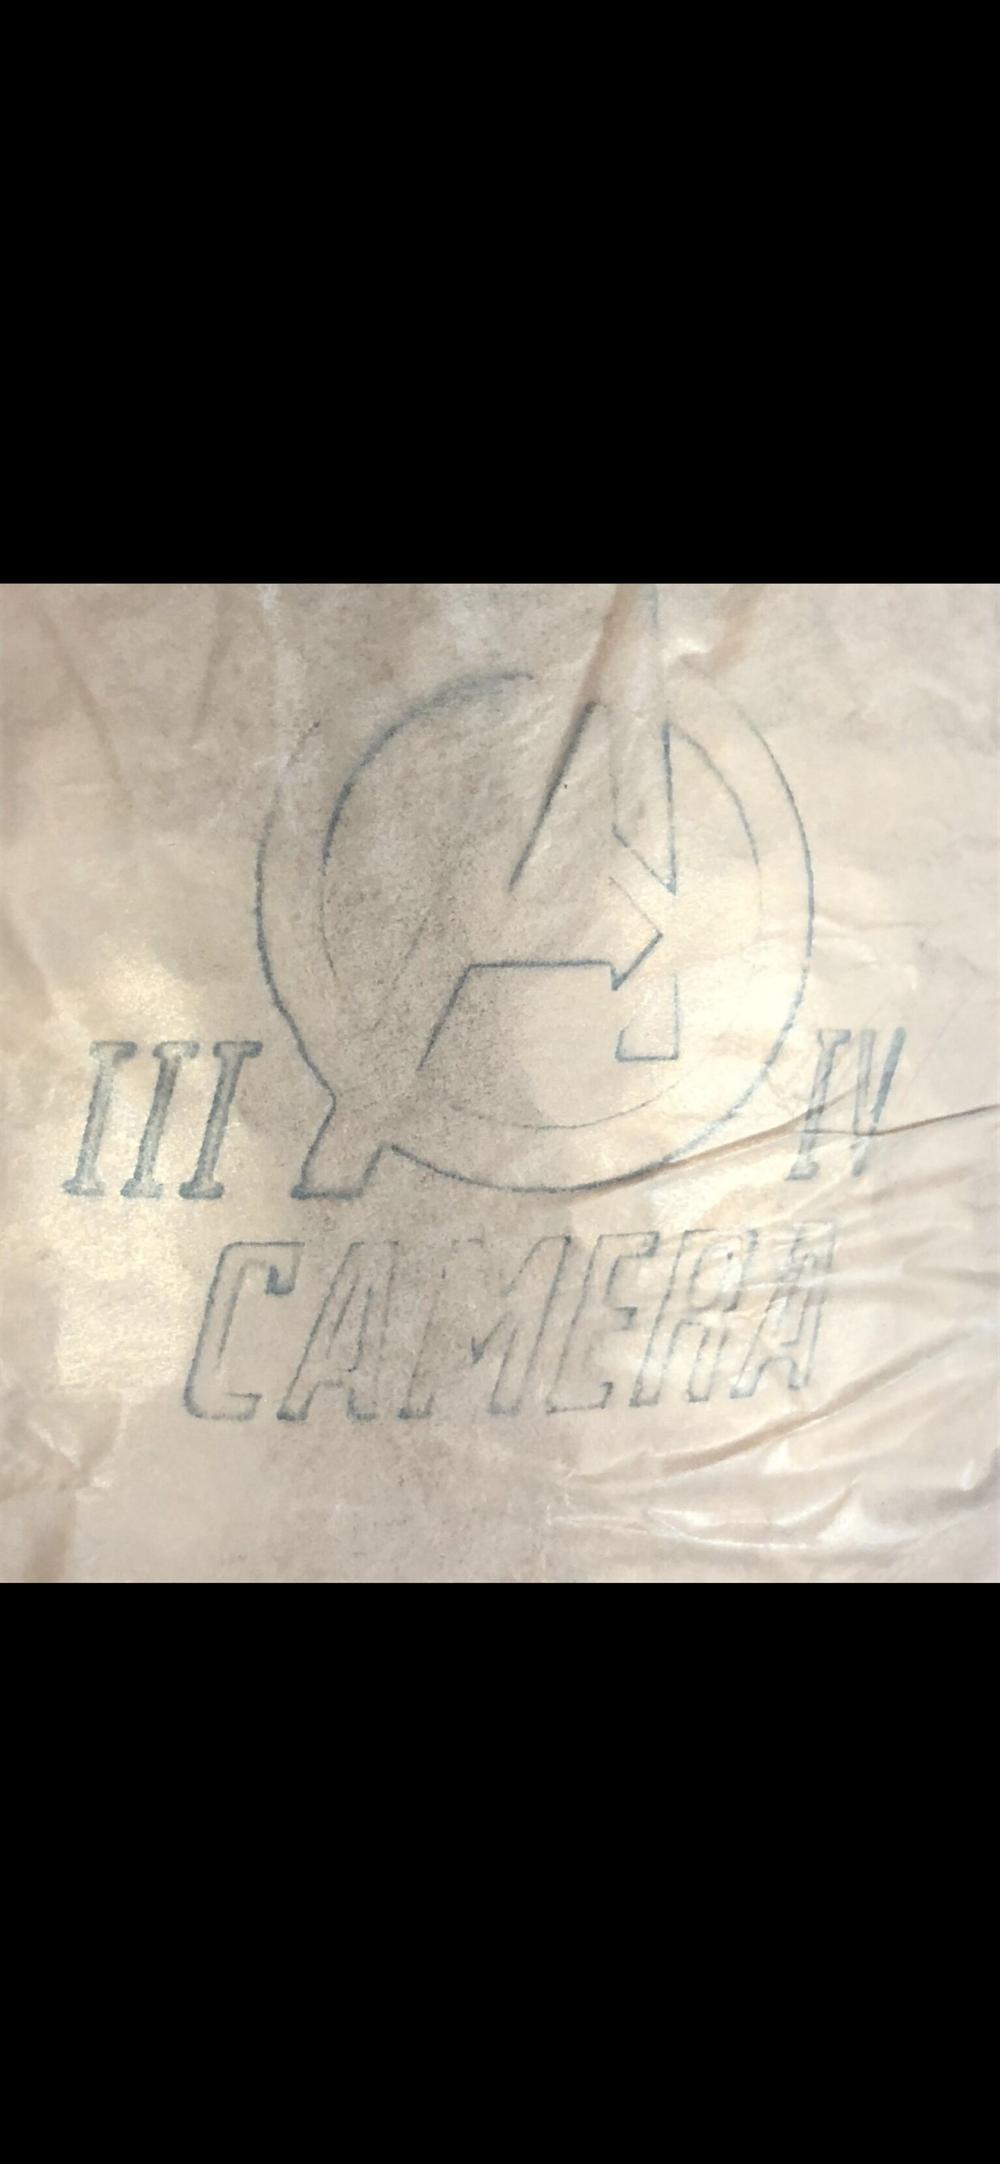 Lot 133: Avengers: Infinity War (2018) & Avengers: Endgame (2019) - Moscow Camera Department Crew Gift Copper Mug - Lot B